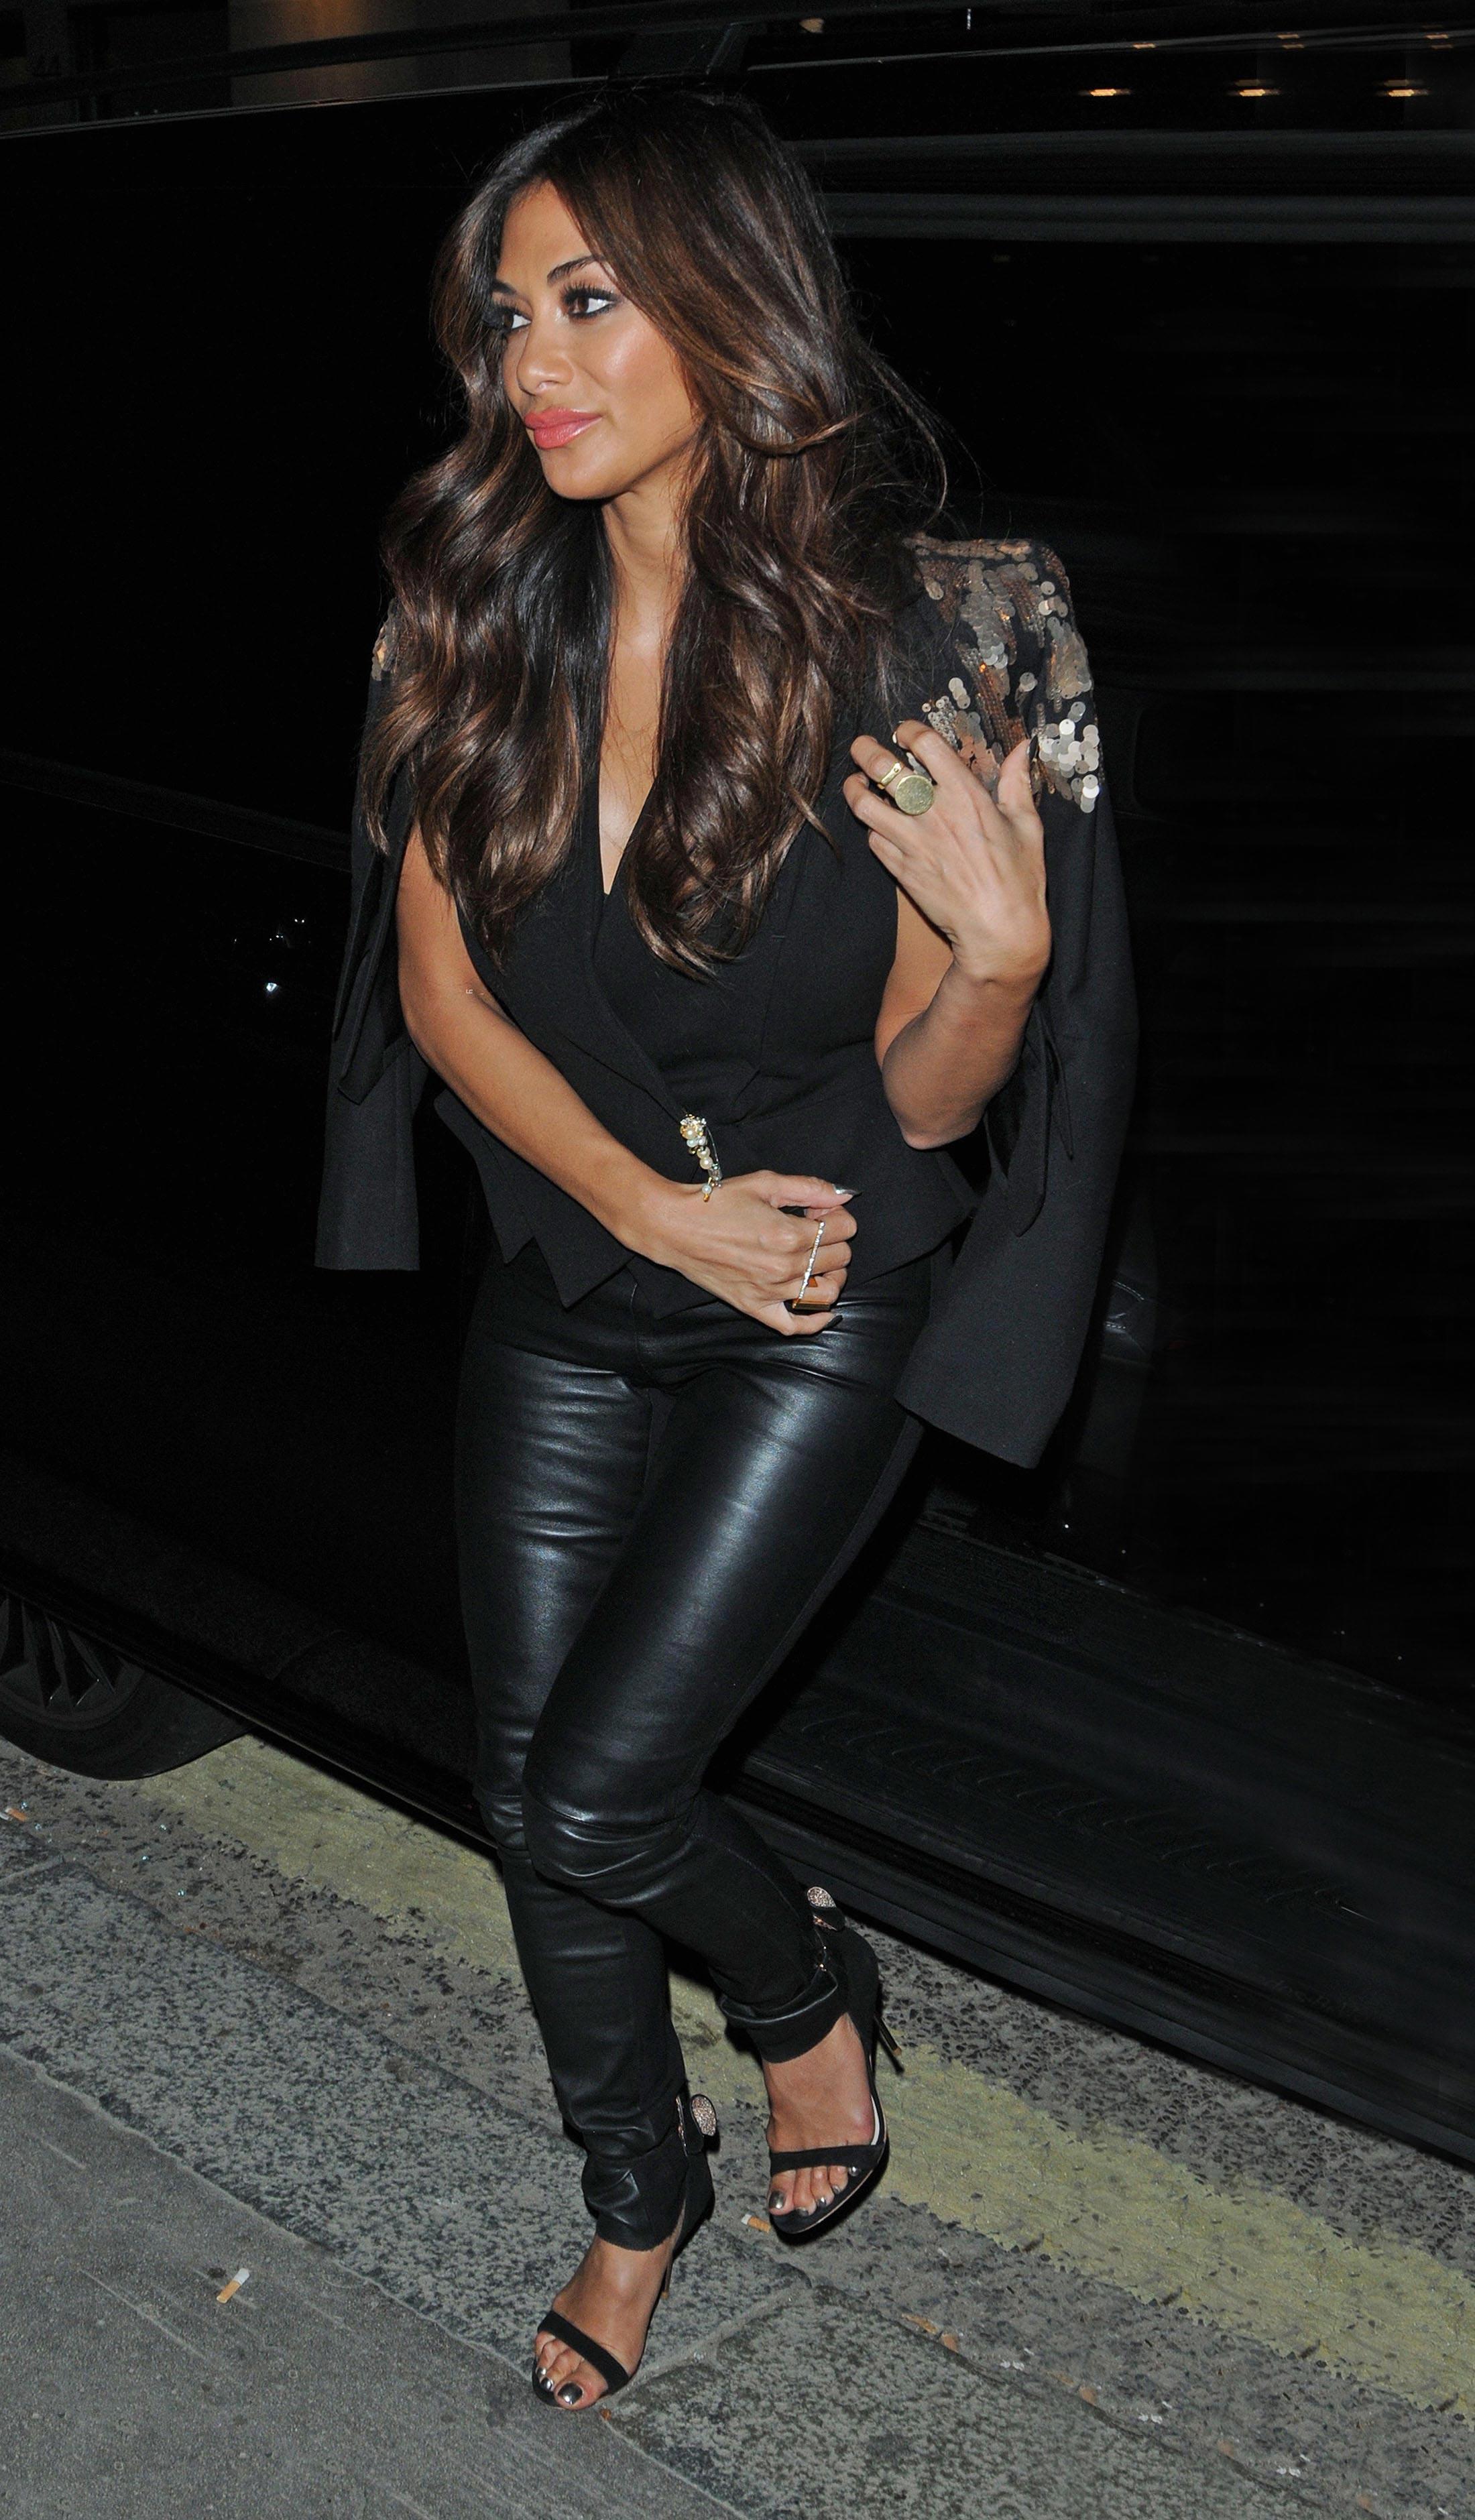 Nicole Scherzinger leaving the Wembley Arena